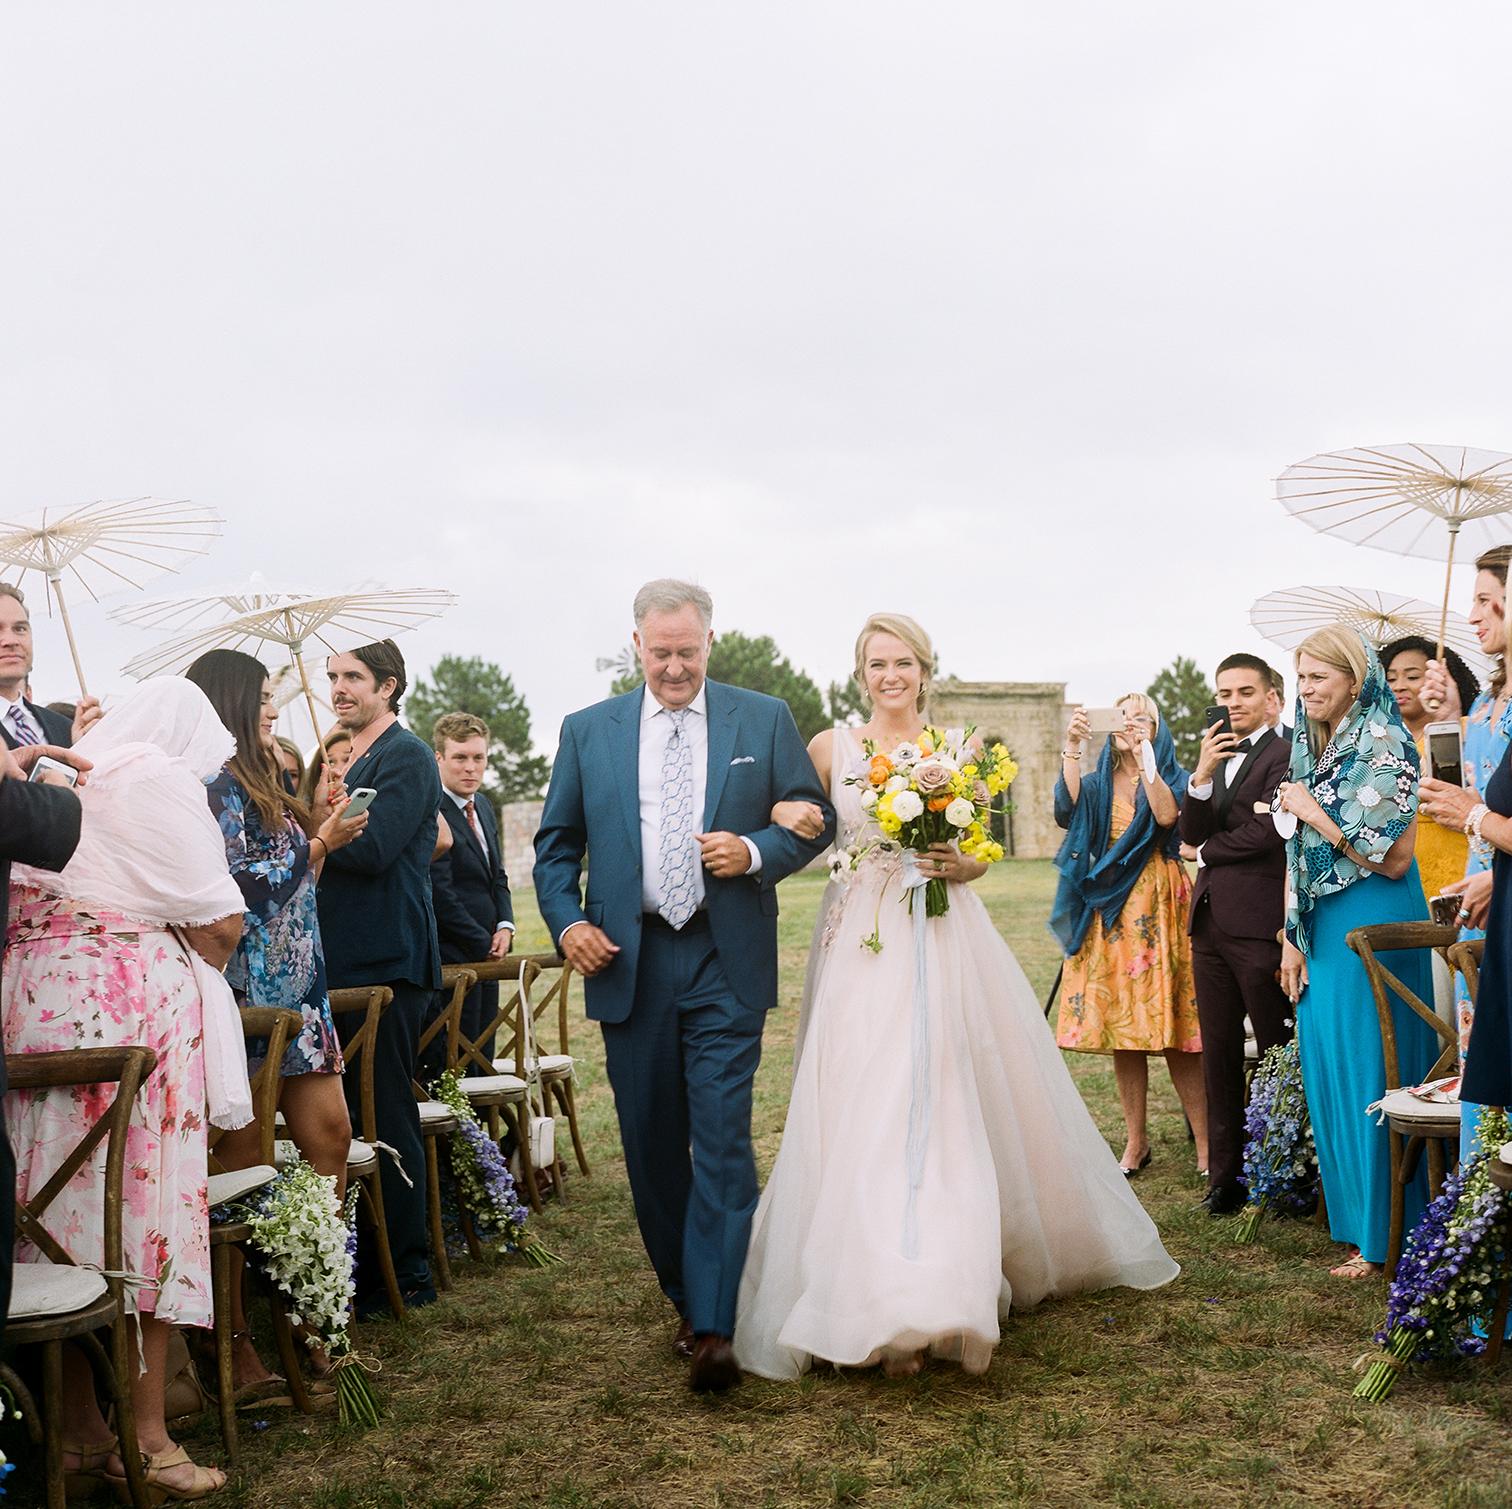 Colorado Wedding Photographers, Father with Bride, Denver Wedding Photos, Destination Weddings, Best Wedding Planners